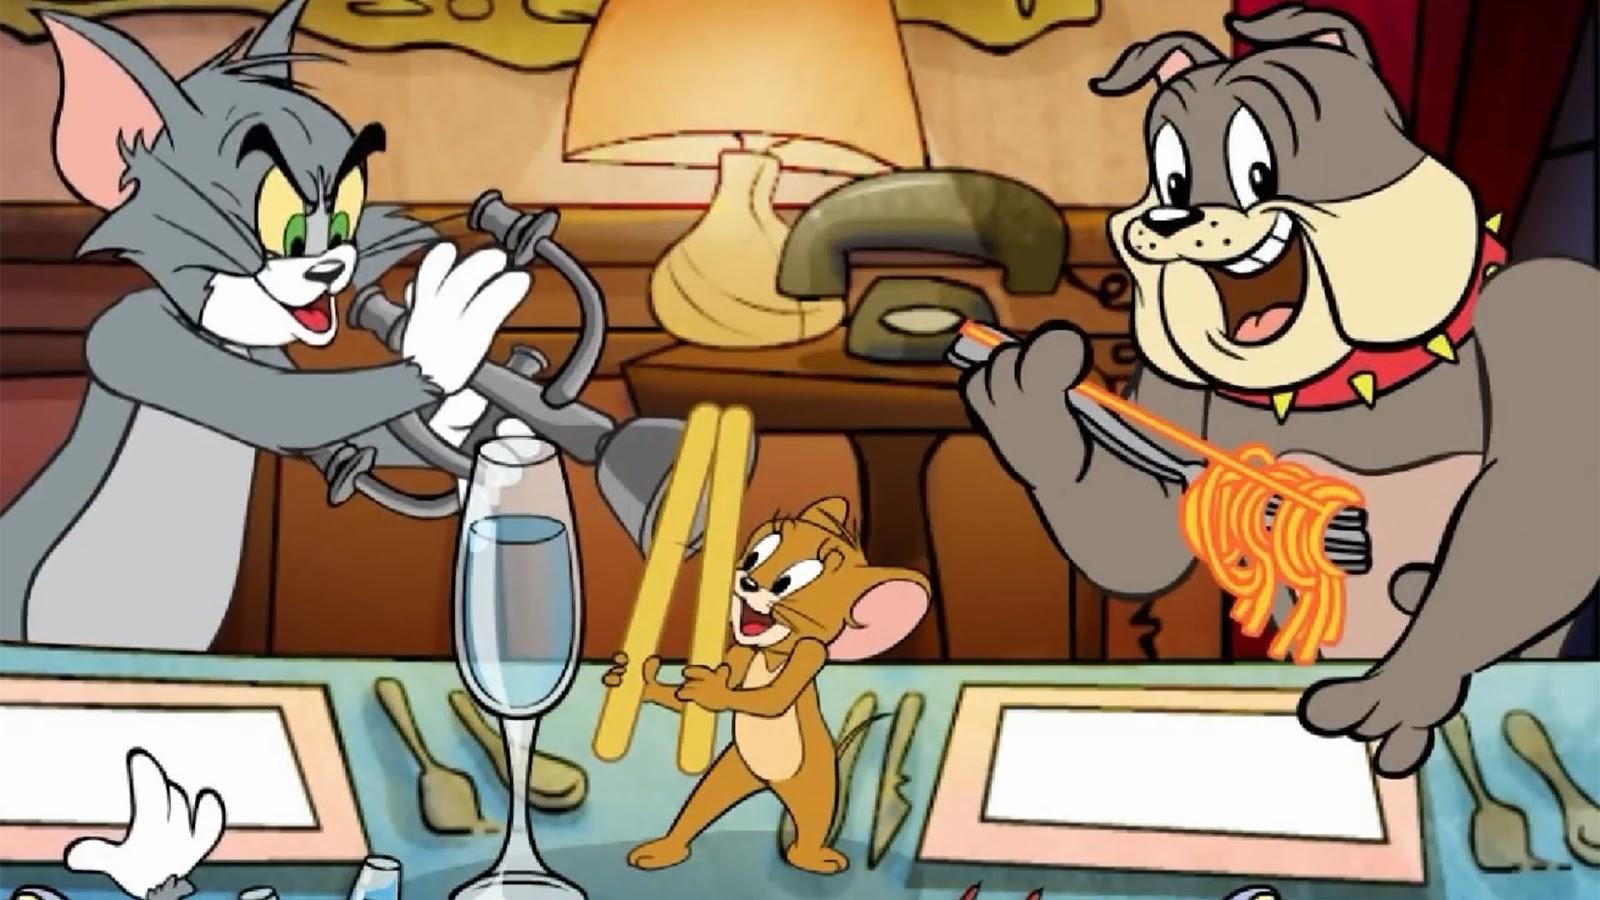 Download Kartun Anak Tom And Jerry Episode Terlengkap